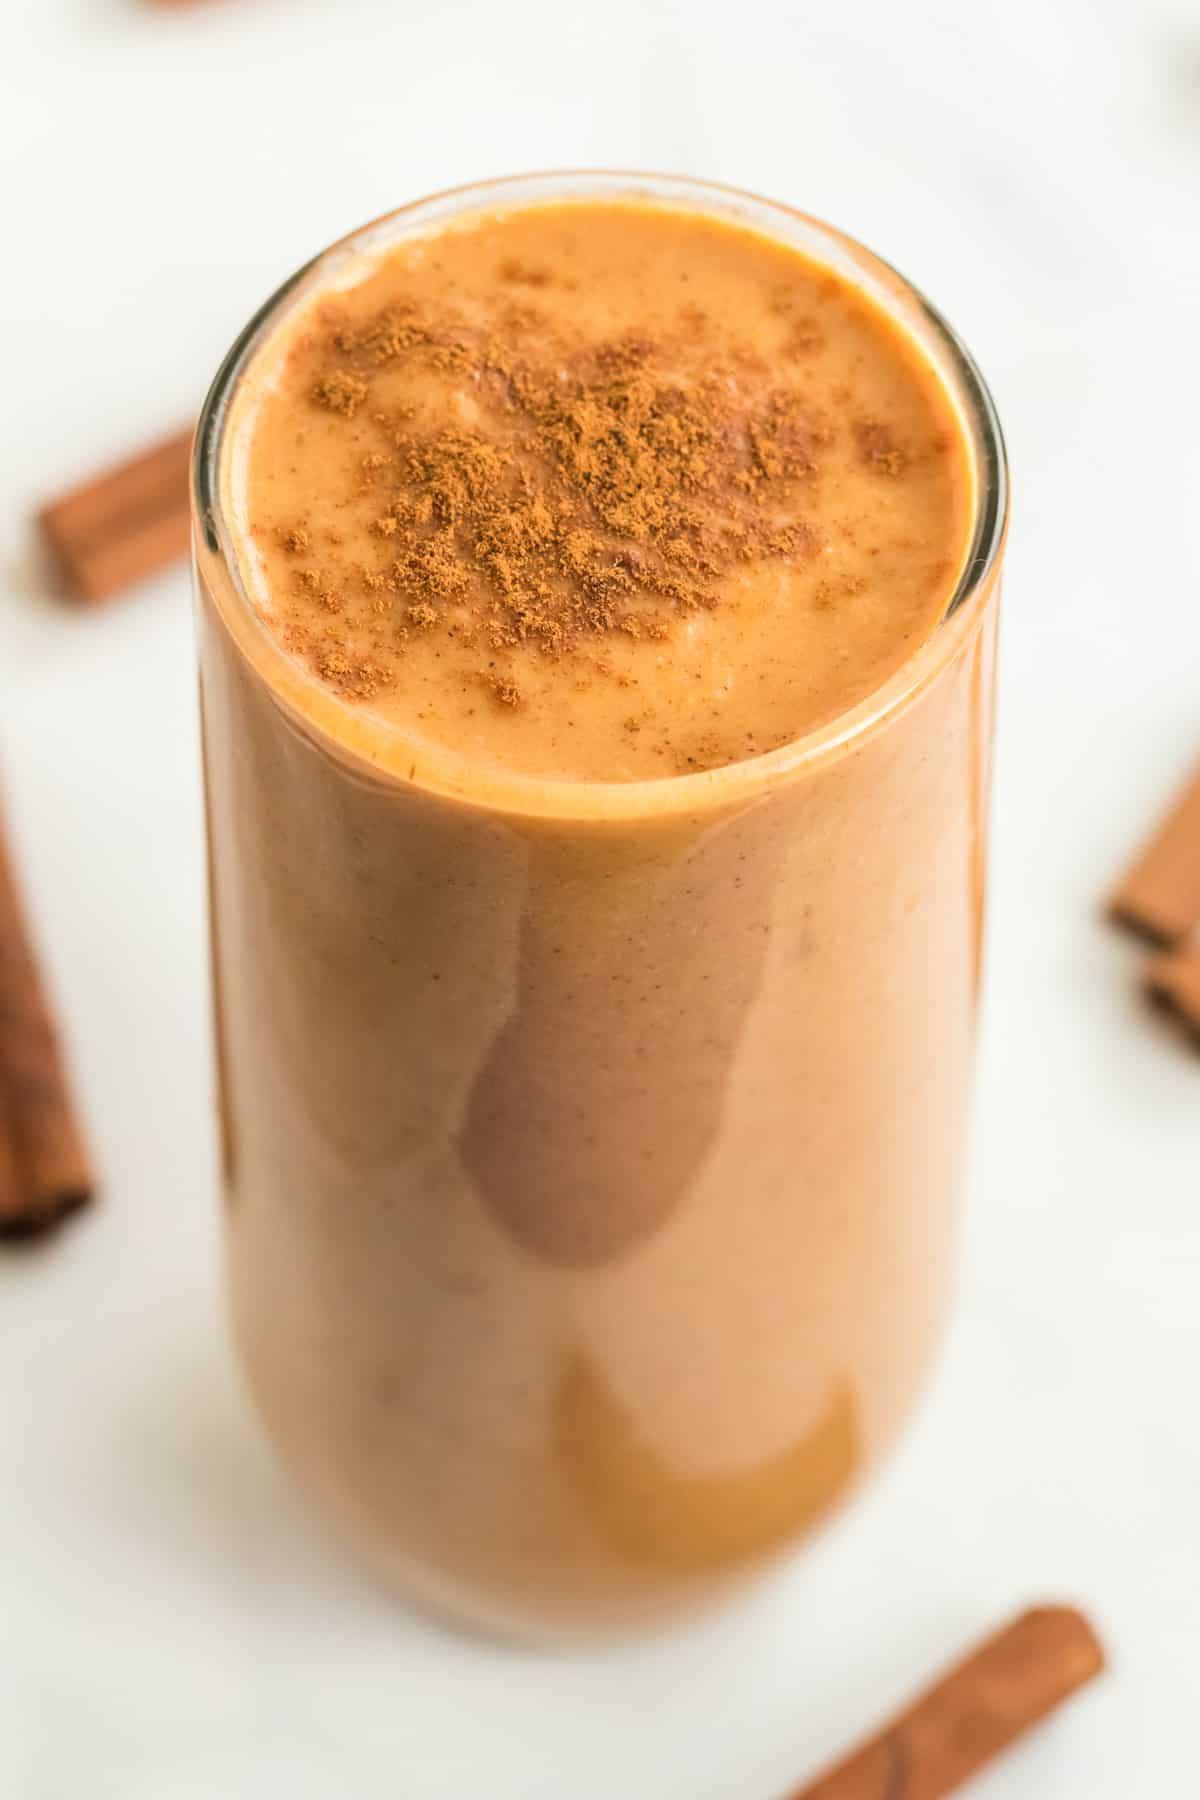 sweet potato smoothie topped with cinnamon